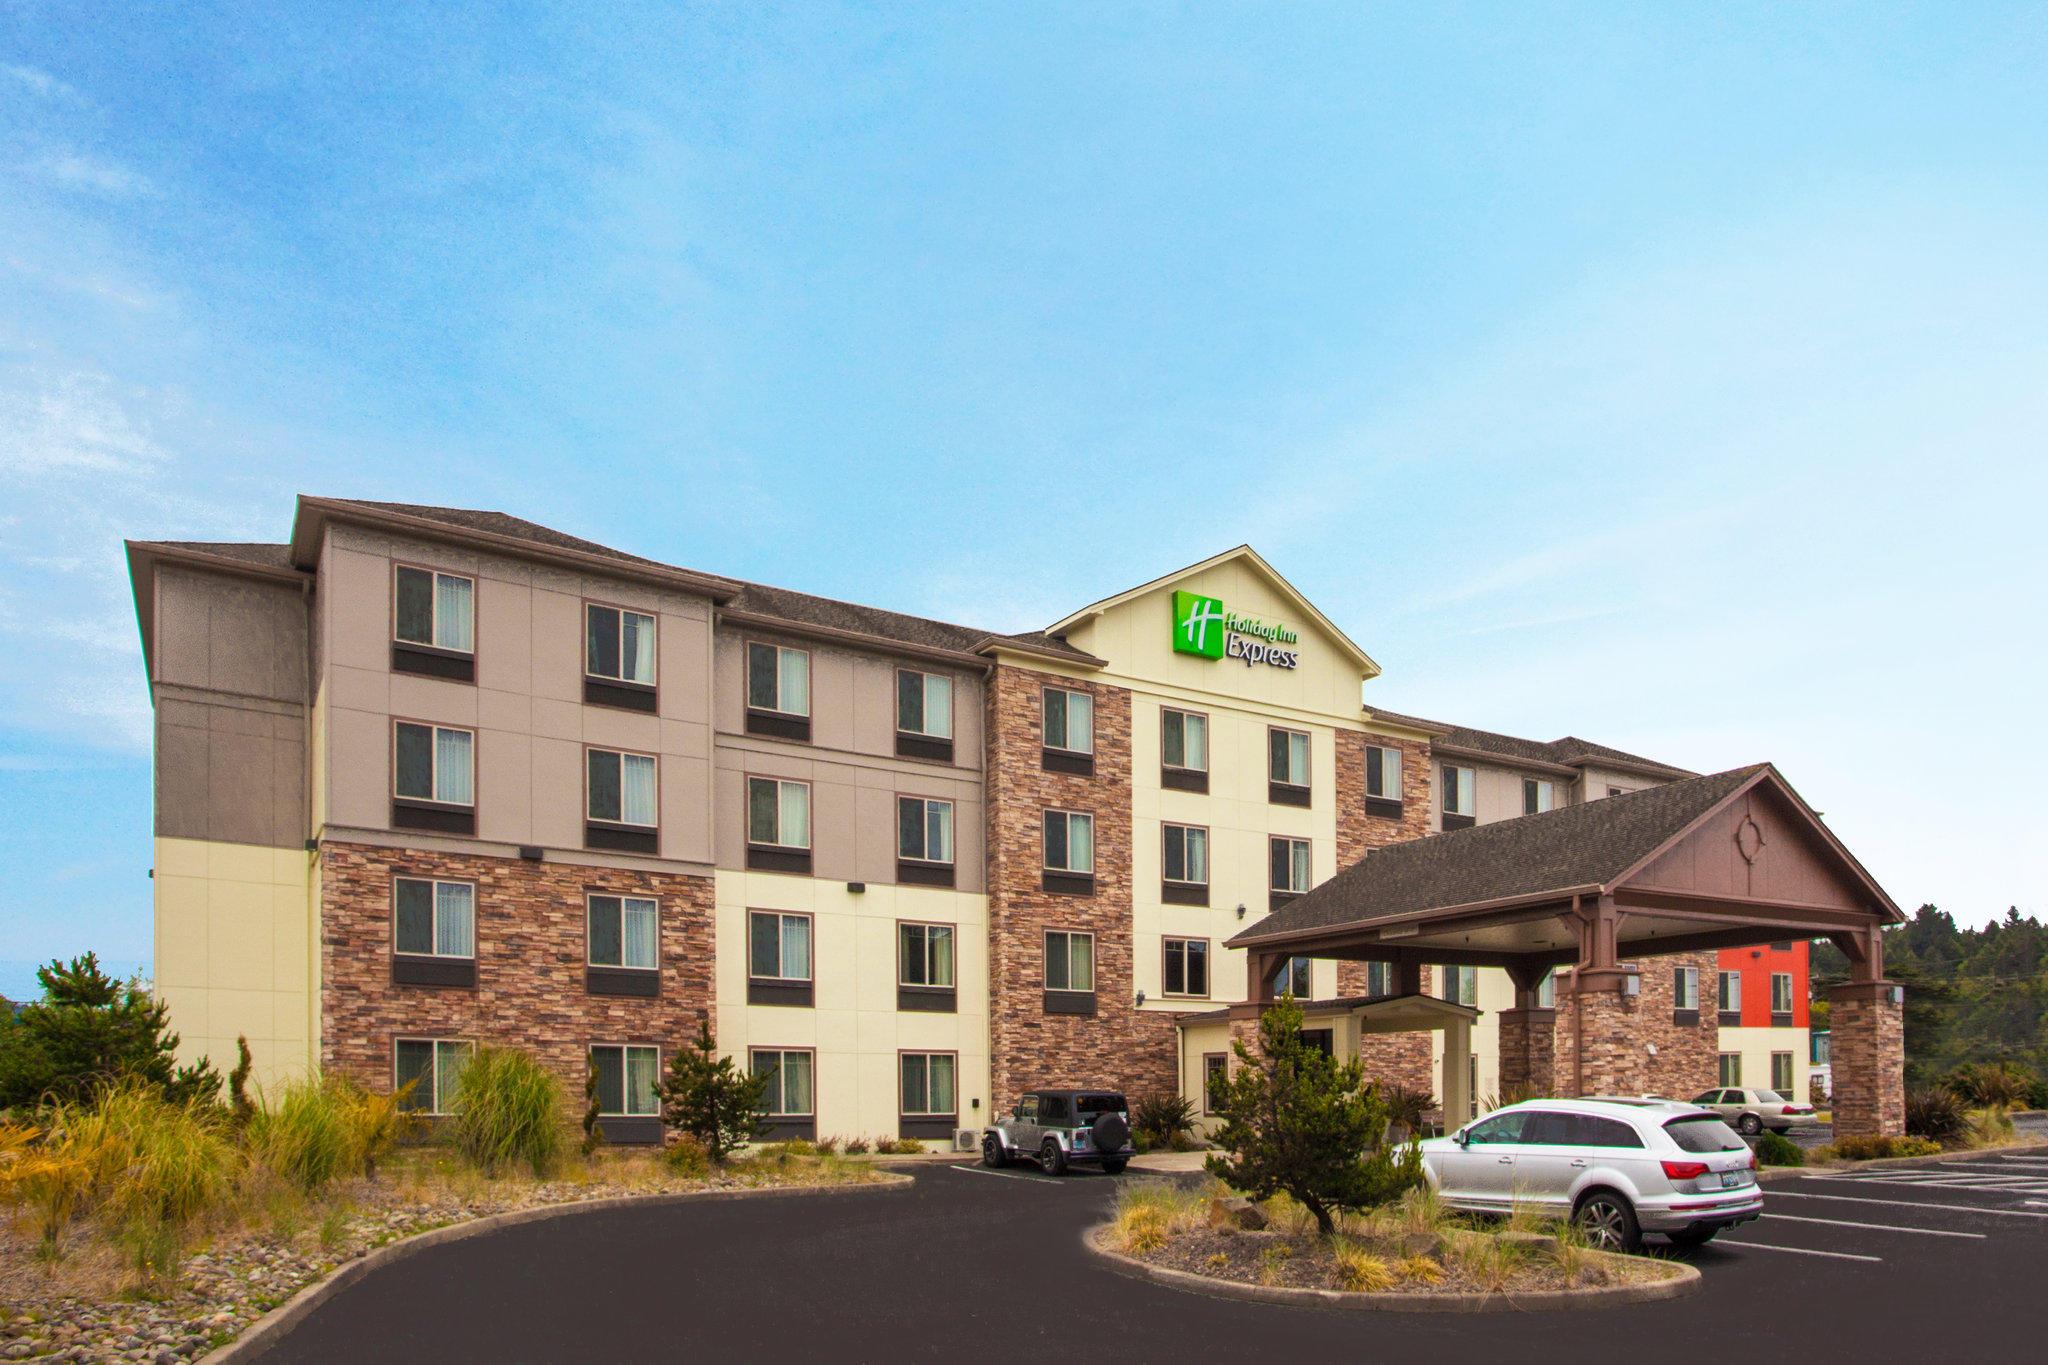 Holiday Inn Express & Suites Newport, an IHG Hotel